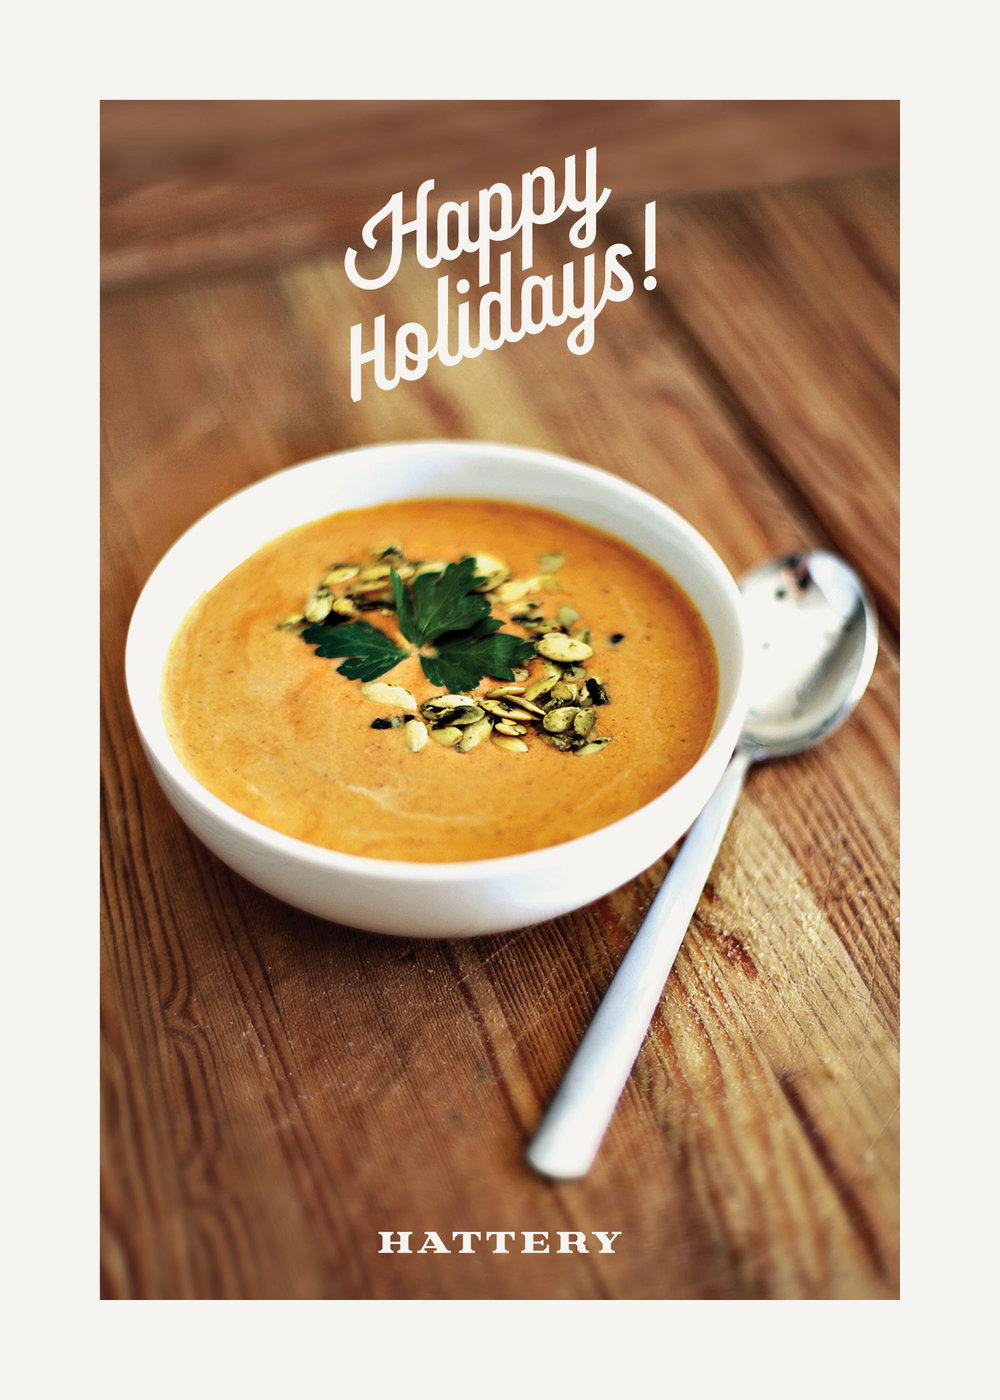 hattery_recipe_holiday.jpg